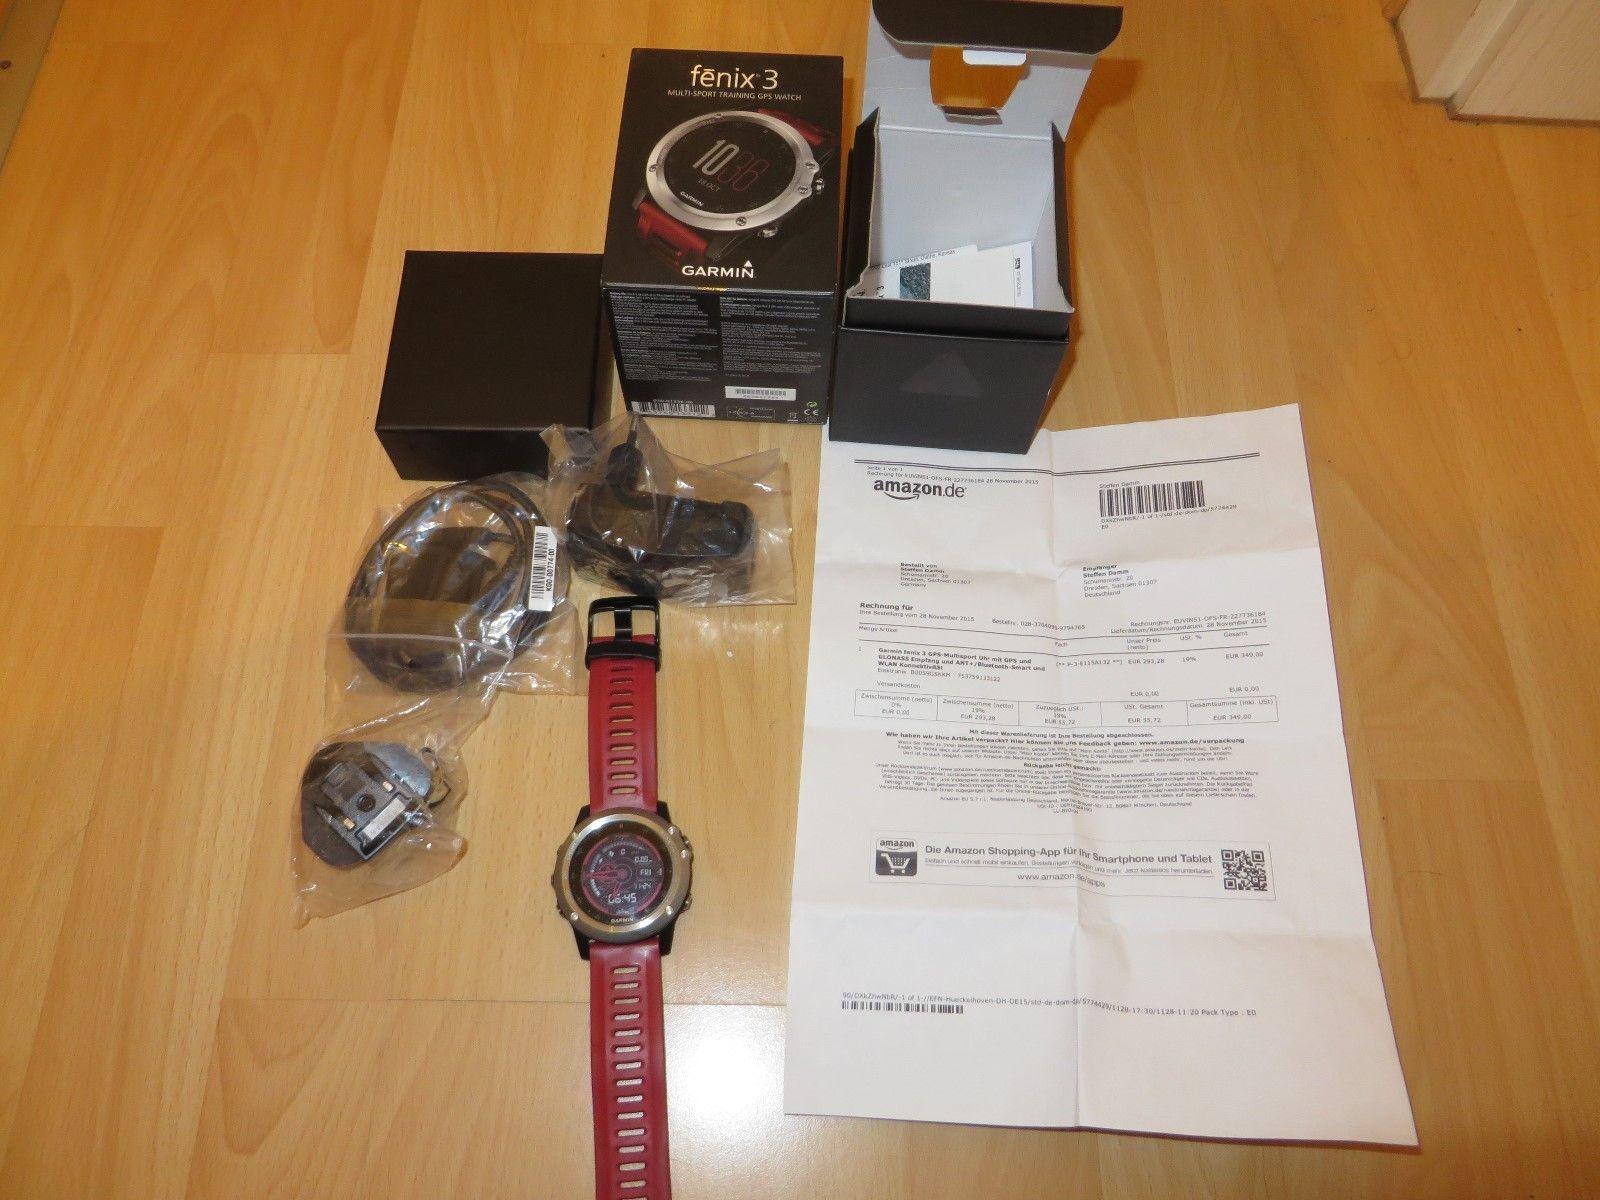 Garmin fenix 3 GPS-Multisportuhr, rotes Band, Bluetooth, WLAN, 2 Jahre alt